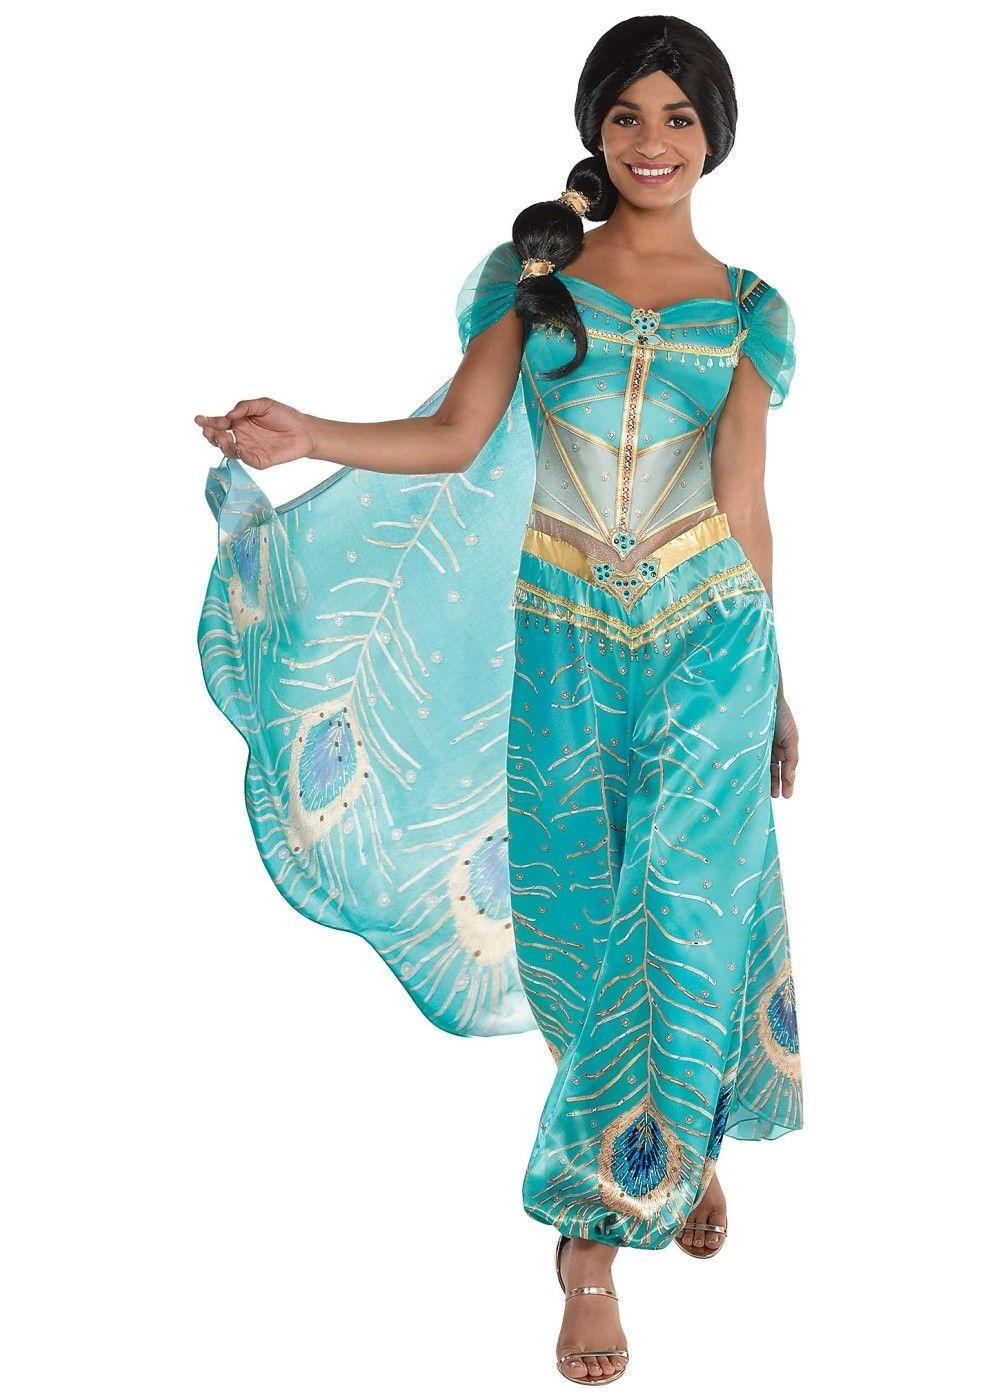 Disney Aladdin Jasmine Costume en 2020 Traje de jazmín